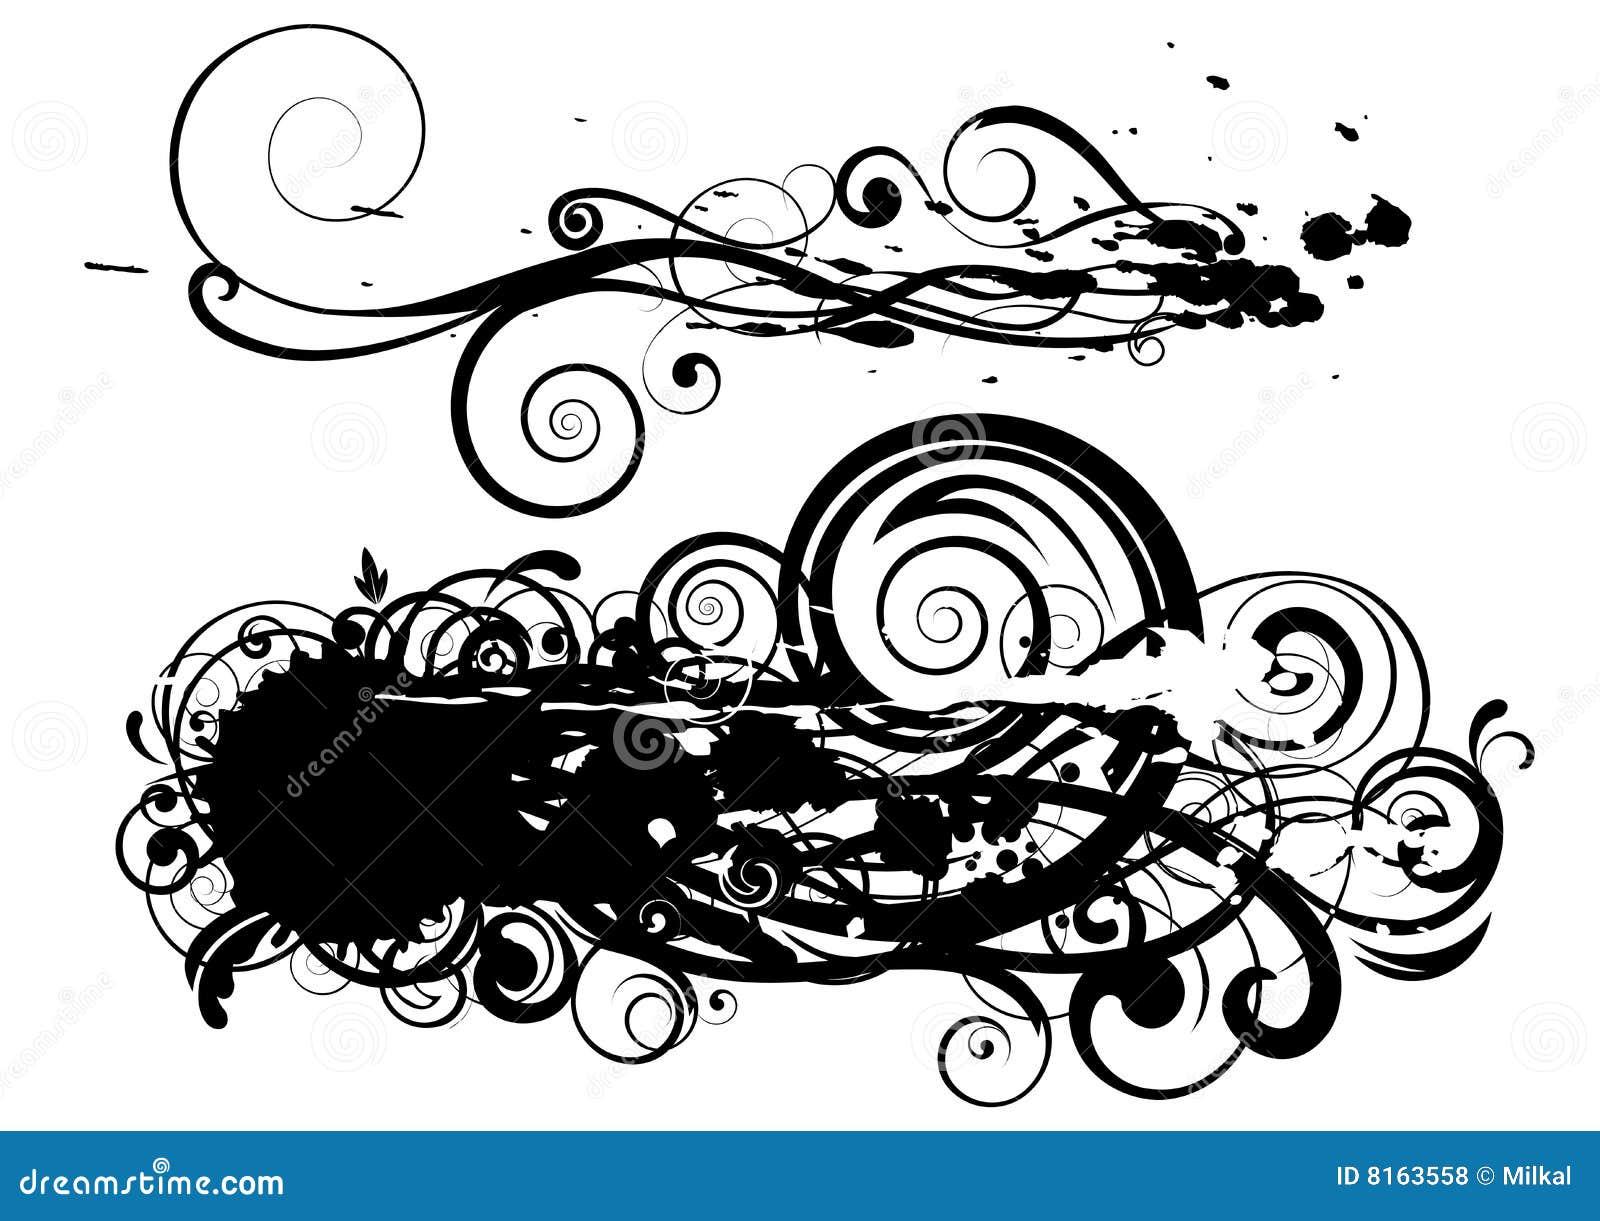 spot swirl design royalty free stock photos image 8163558. Black Bedroom Furniture Sets. Home Design Ideas